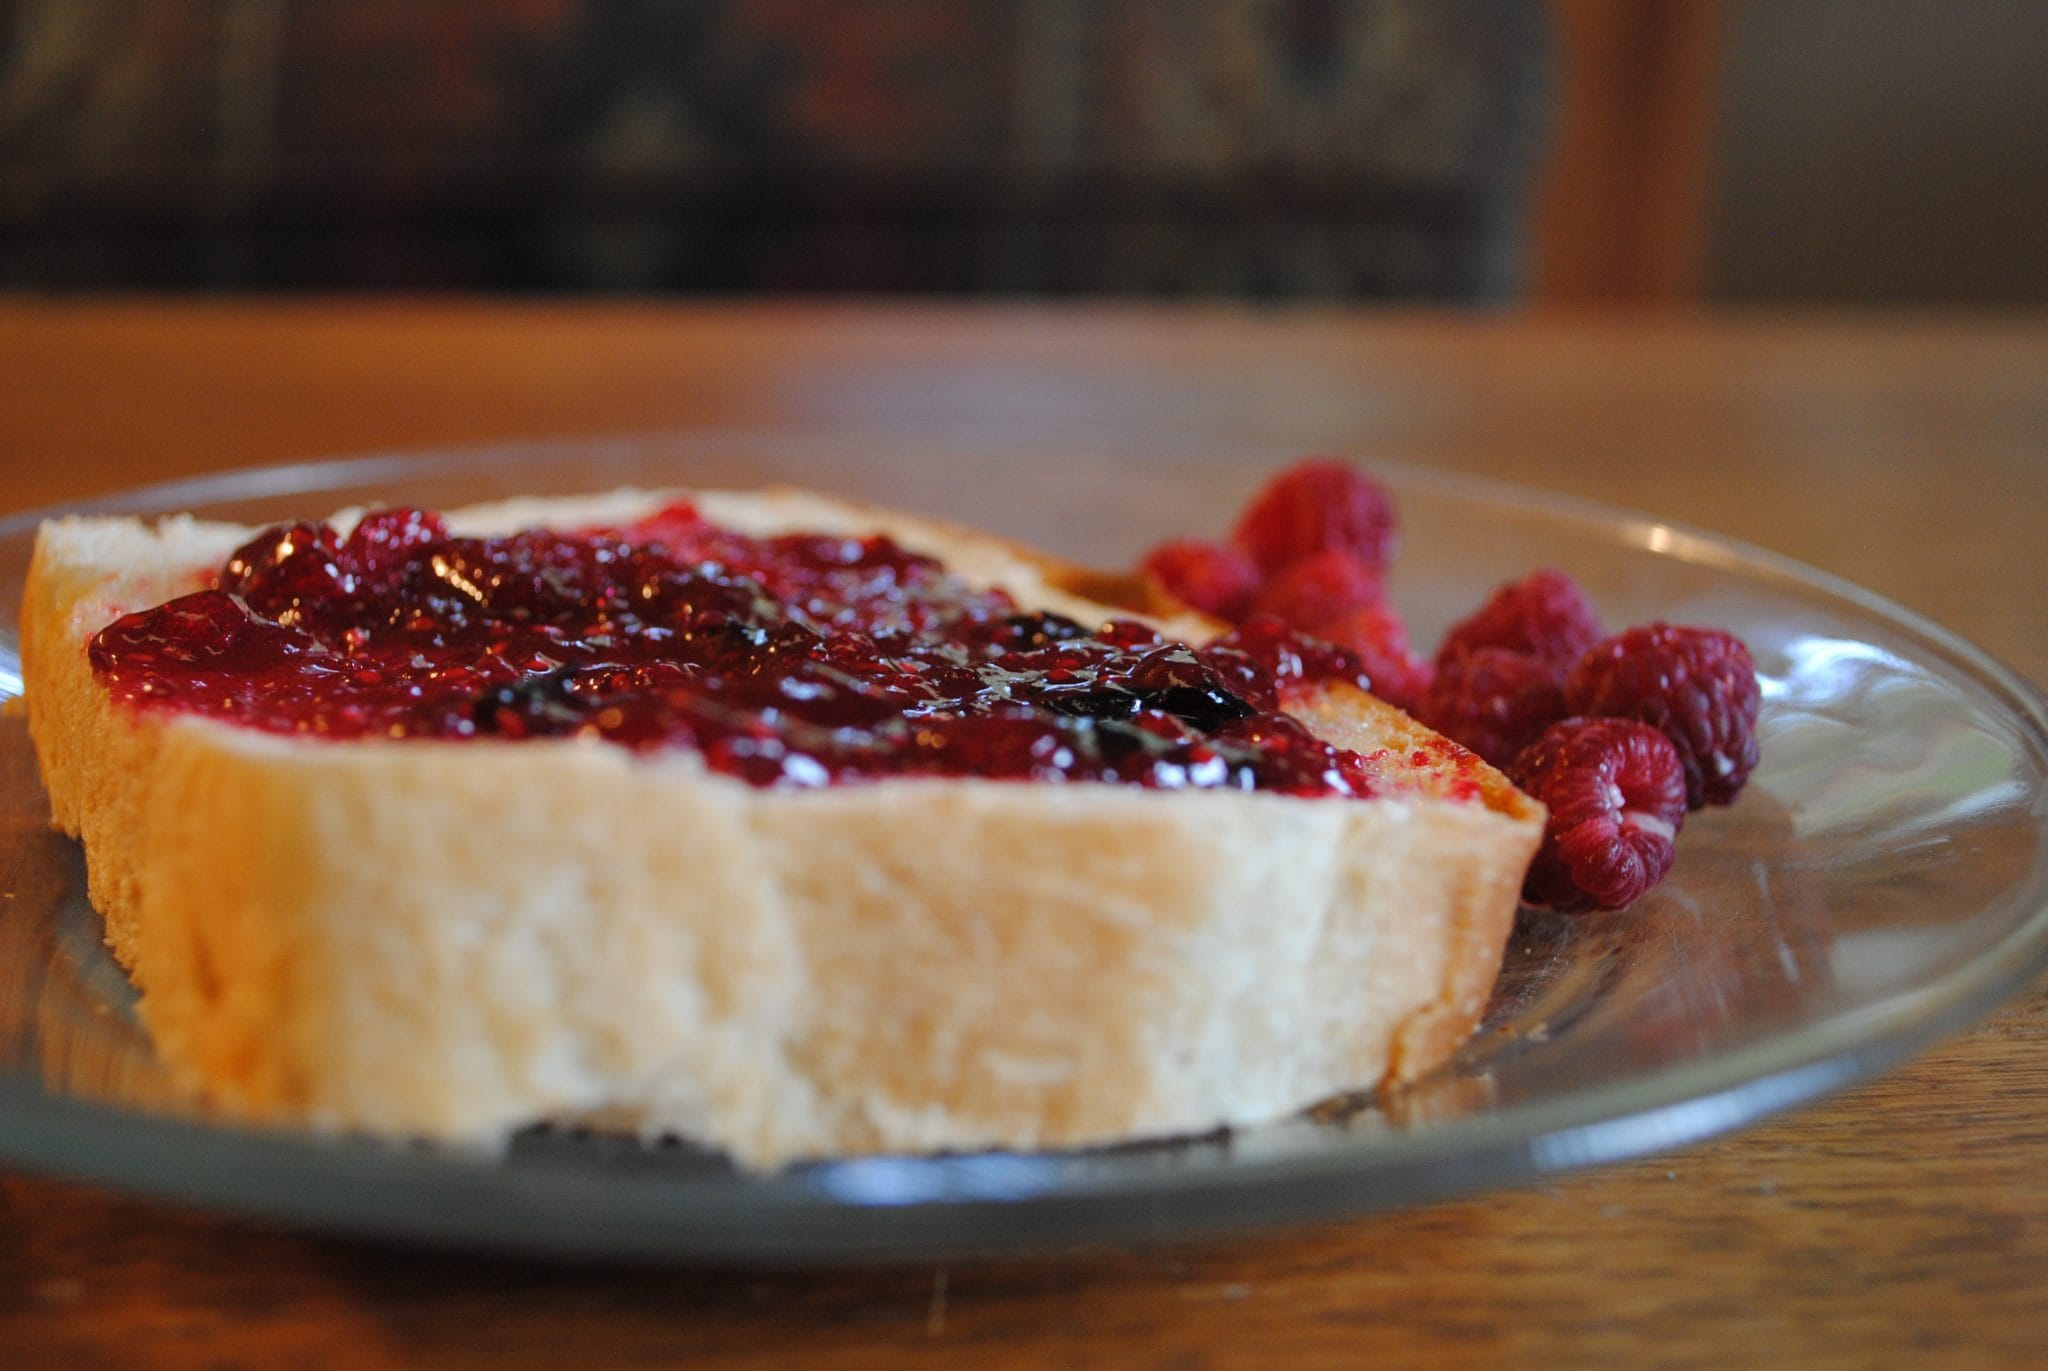 Raspberry/Blueberry Jam